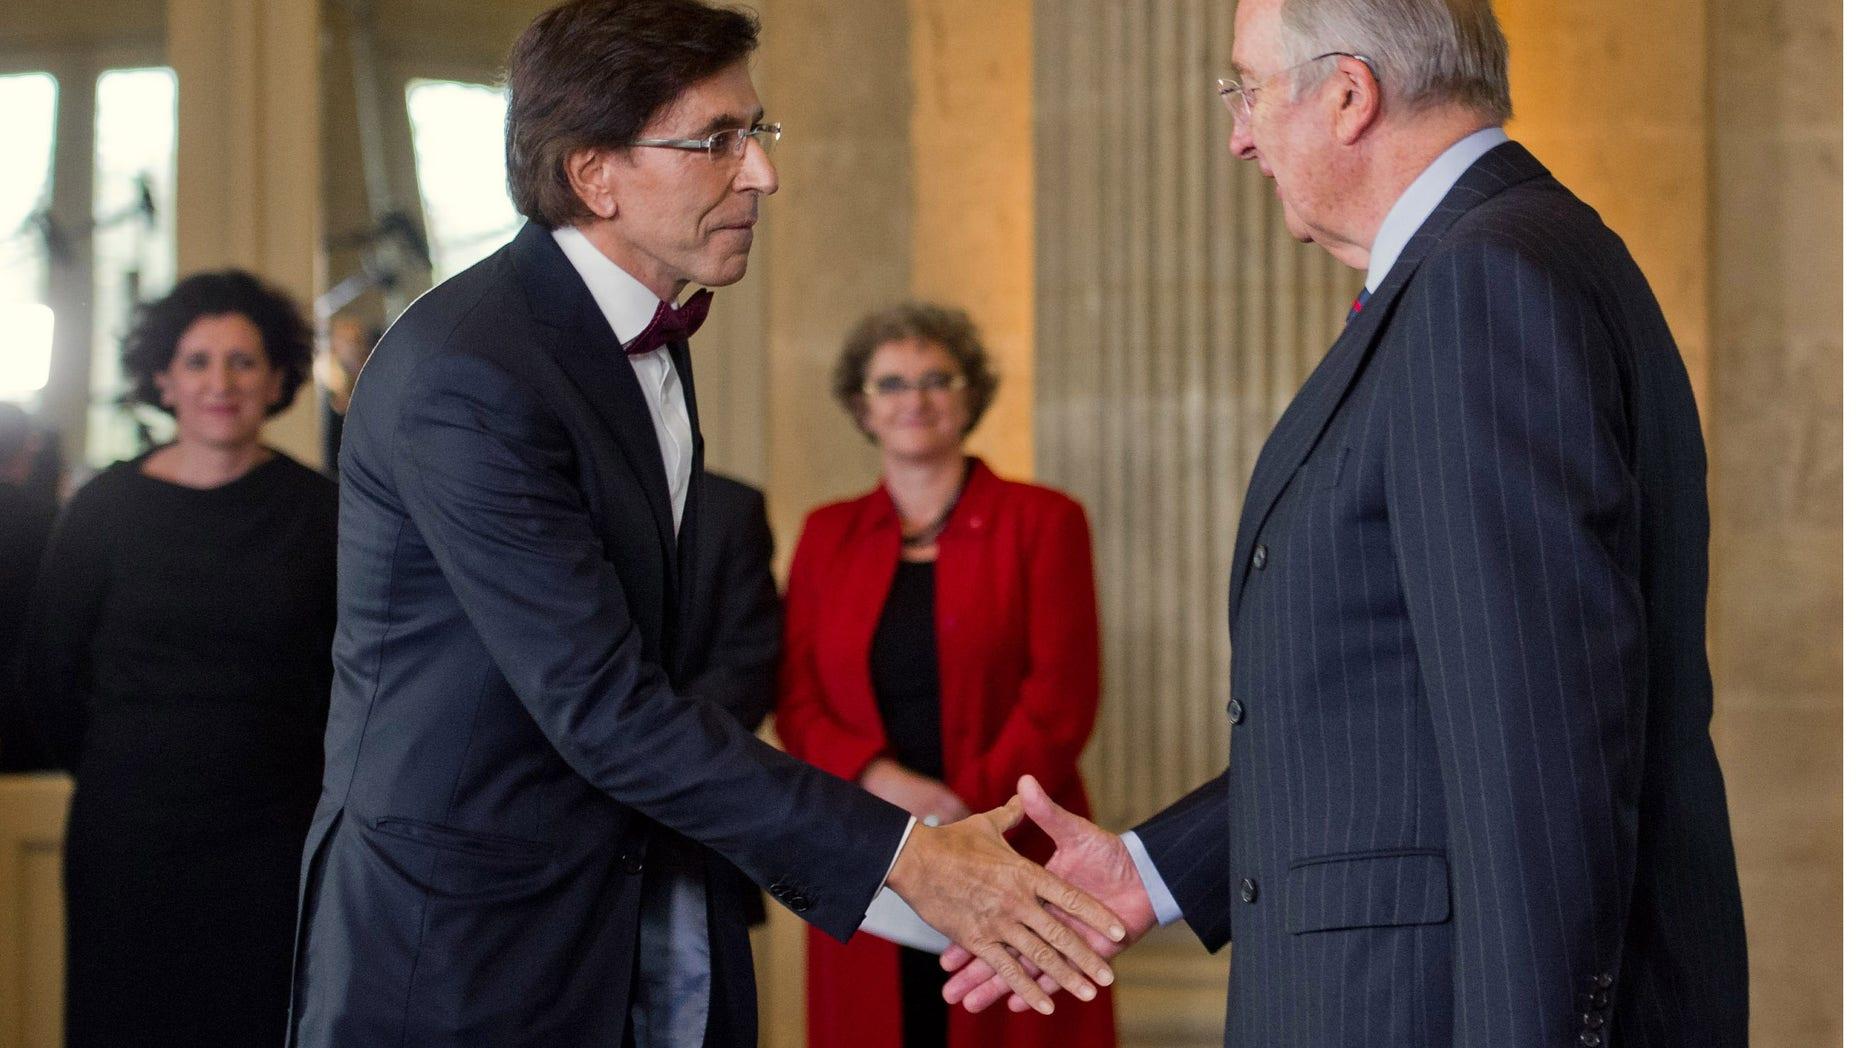 Dec. 6: Elio Di Rupo, left, shakes hands during a swearing-in ceremony with Belgian King Albert II.